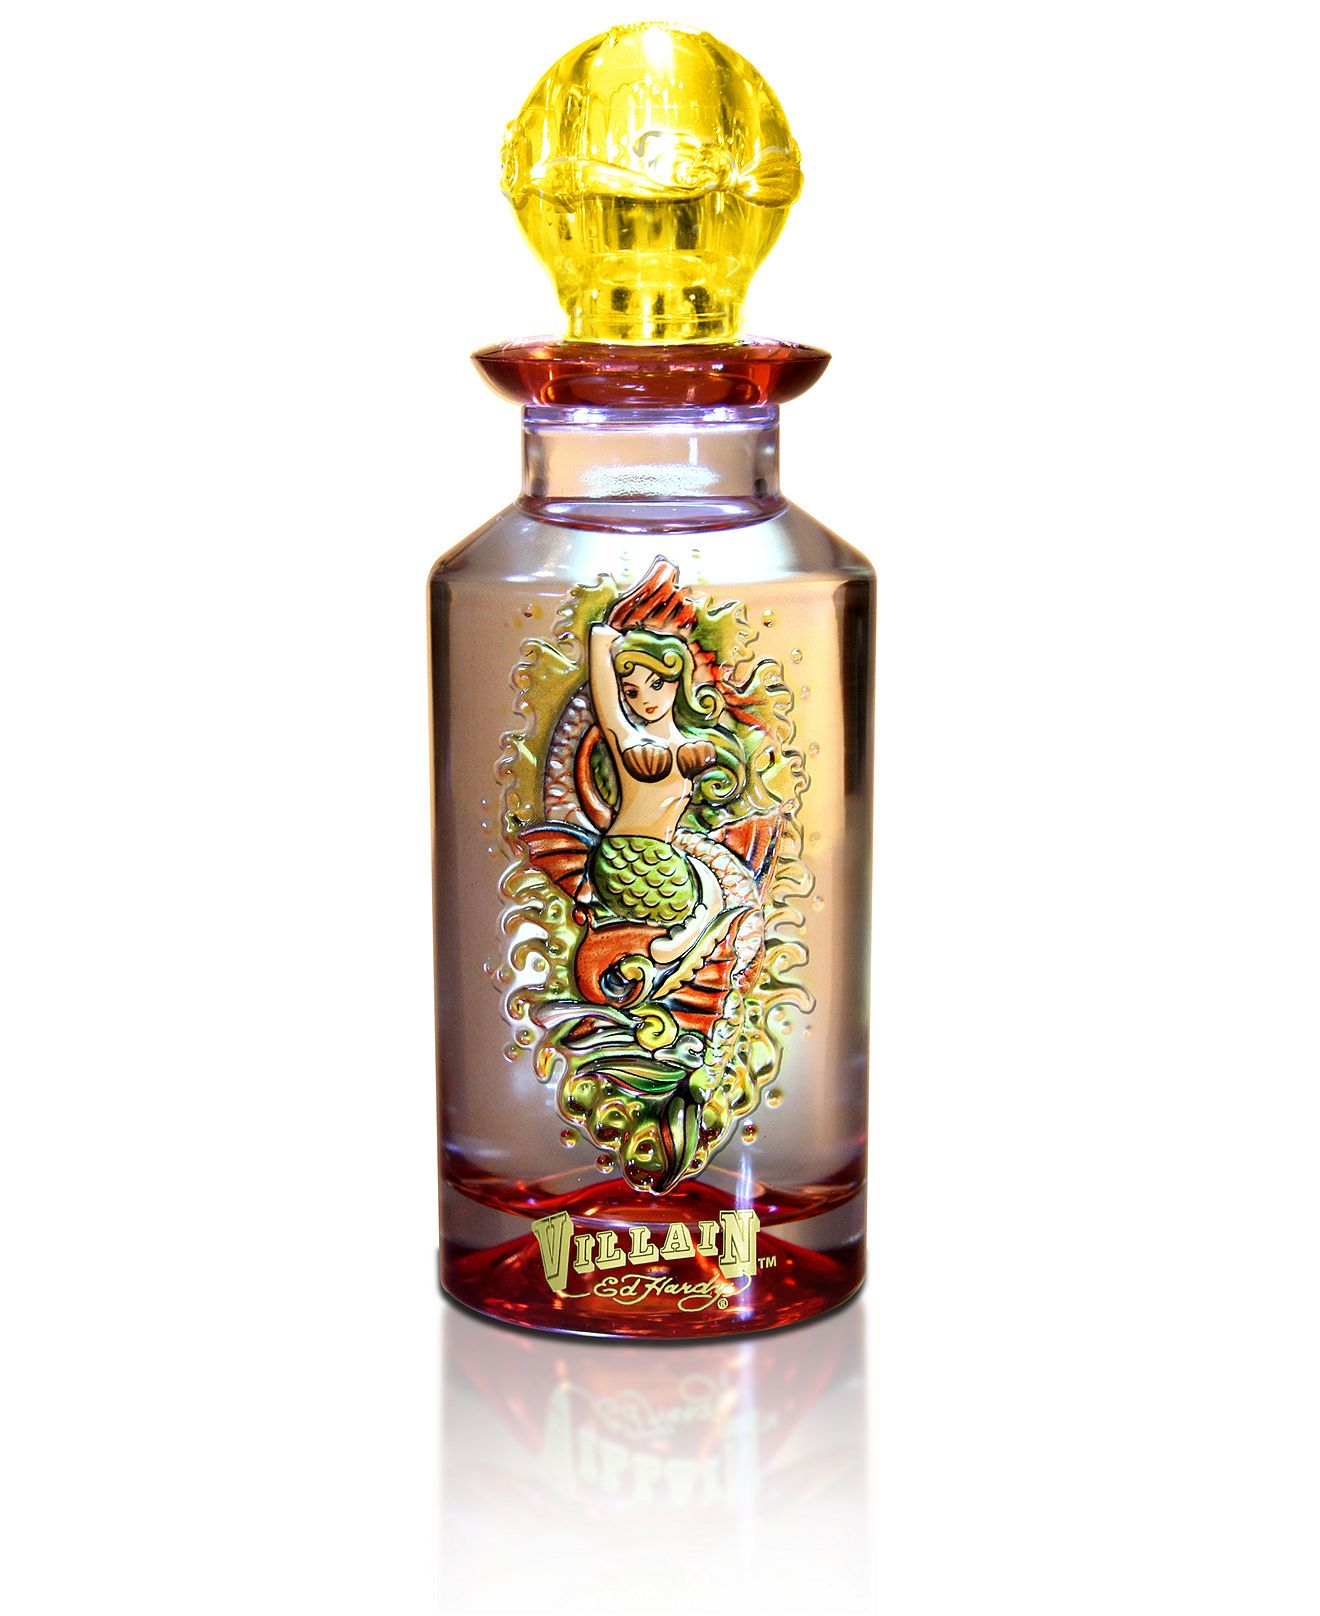 Ed Hardy Villain for Women Ed hardy perfume, Women